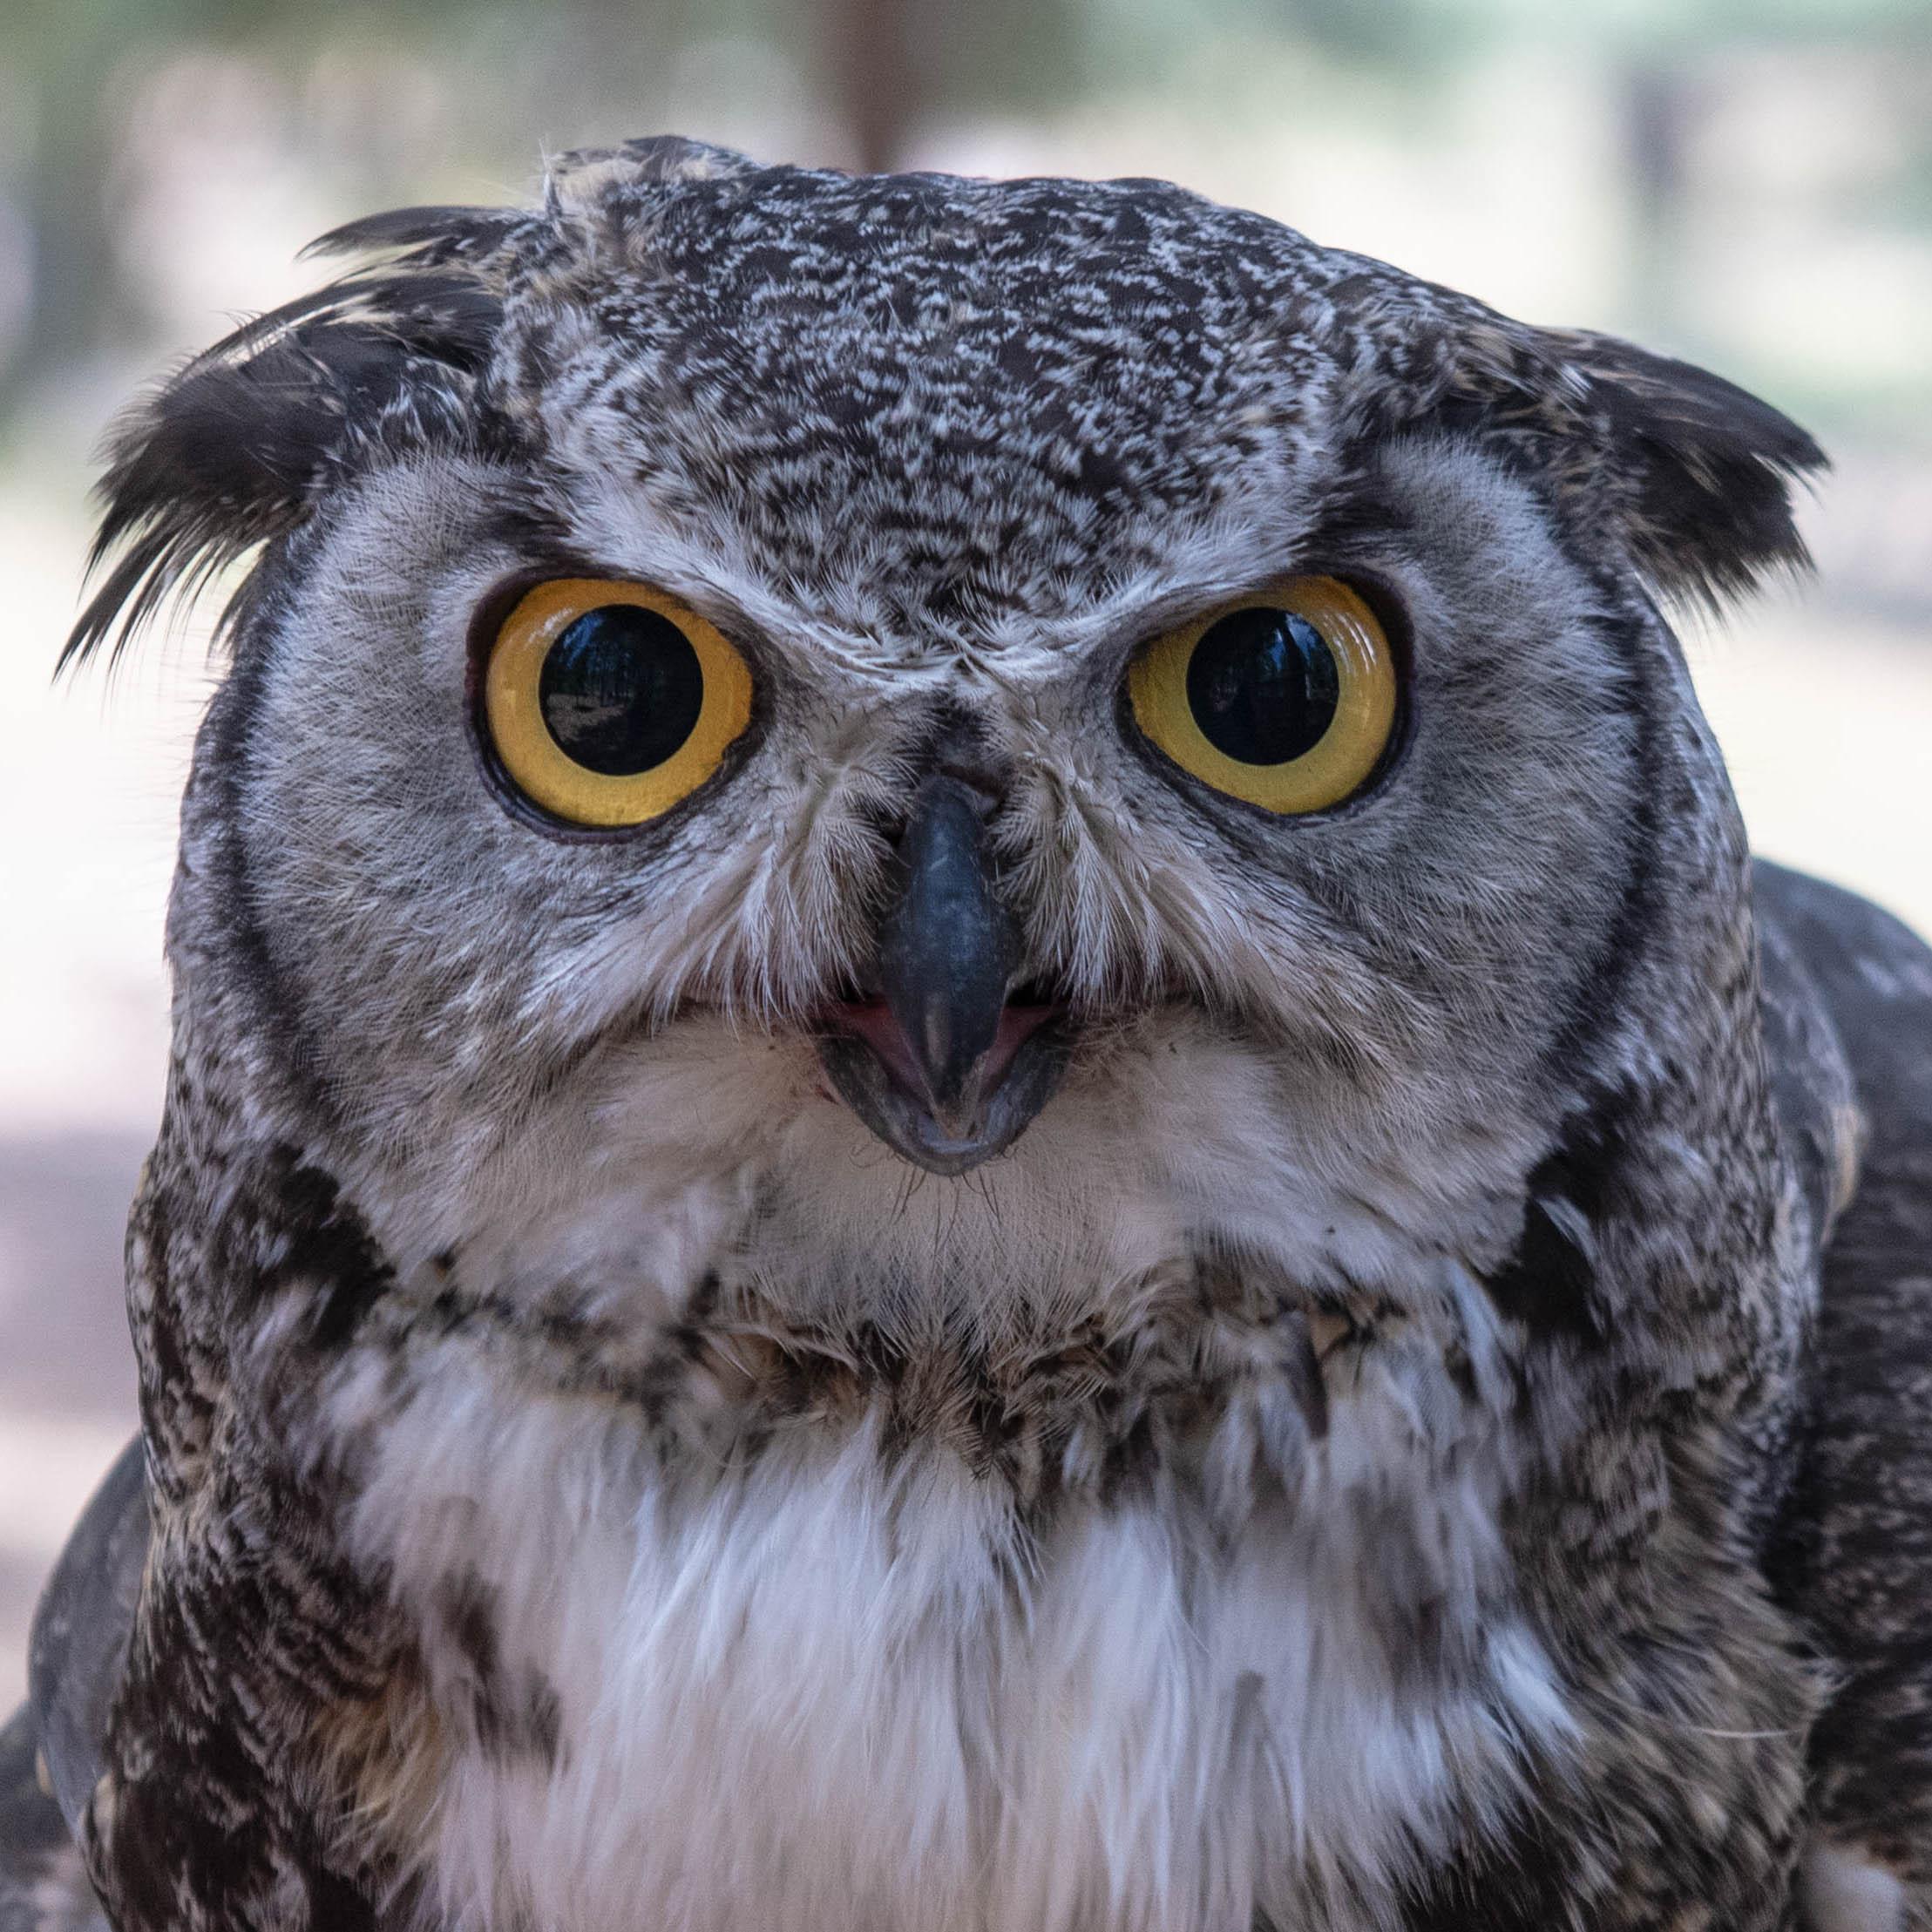 Dudley-Great Horned Owl- (Bubo virginianus)